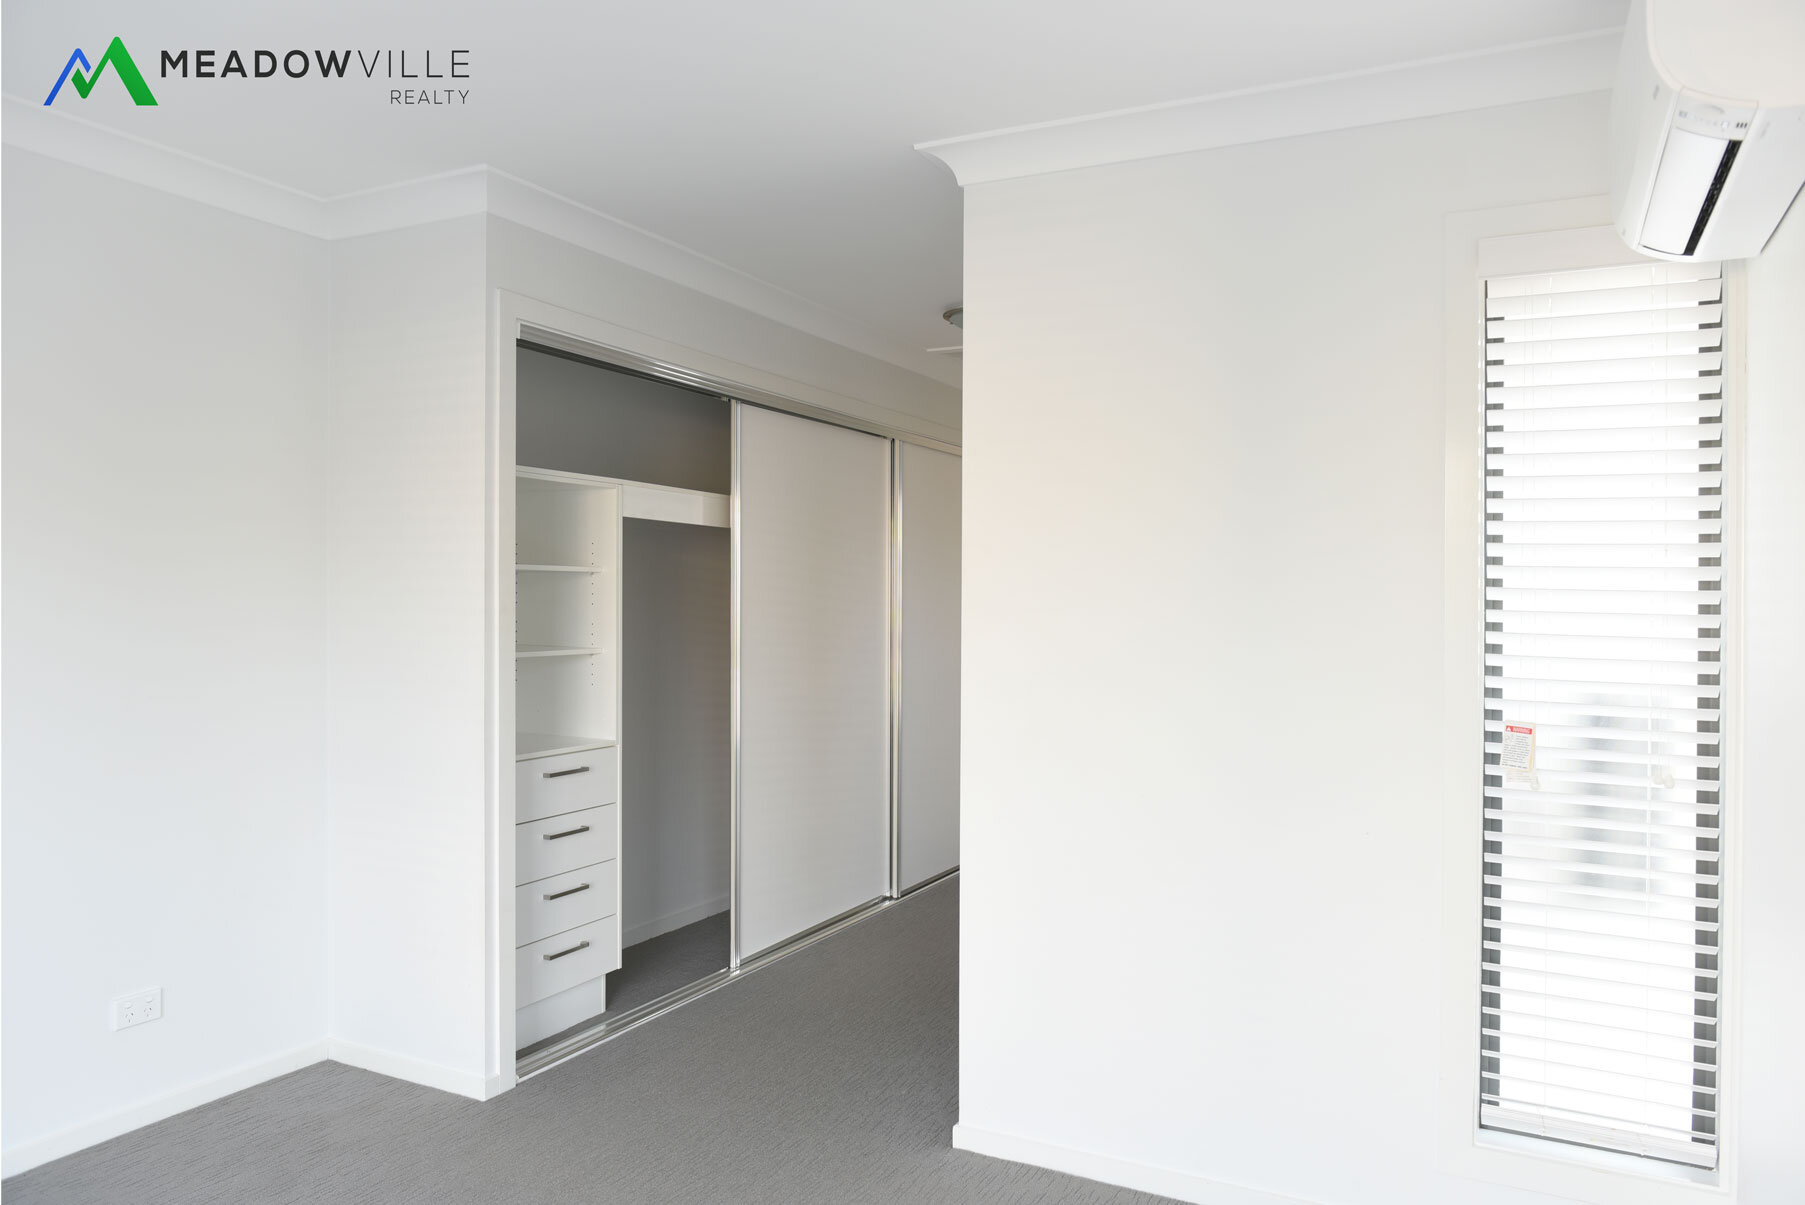 room1_a.jpg